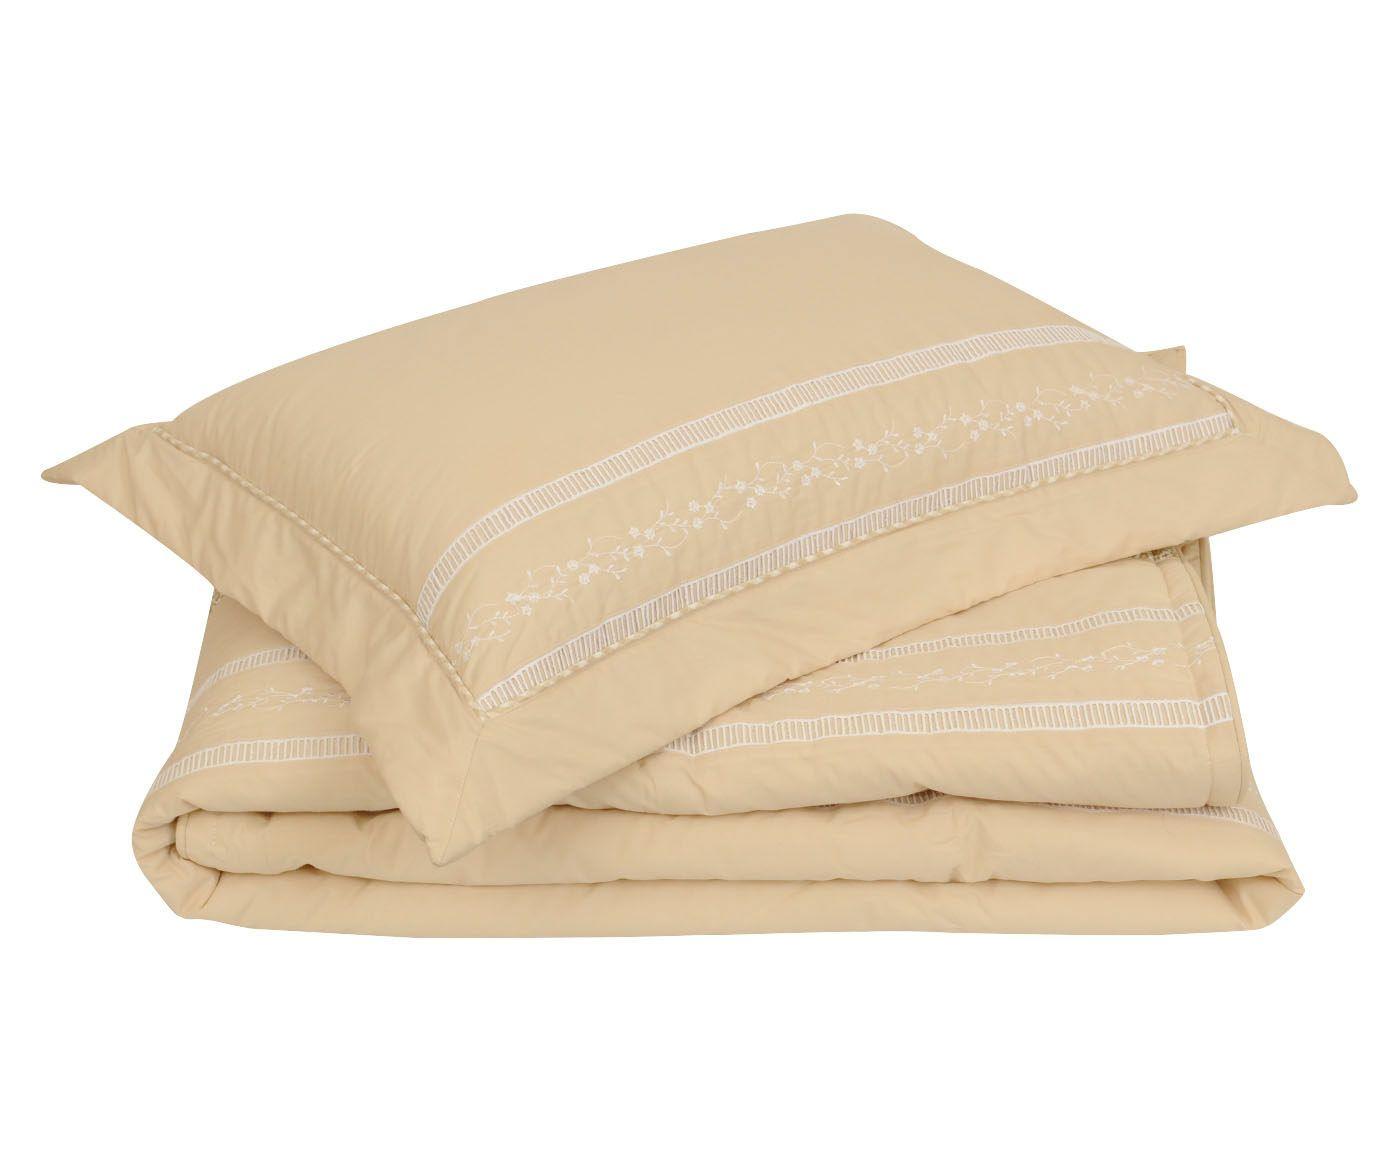 Conjunto de colcha daya para cama super king size 200 fios | Westwing.com.br